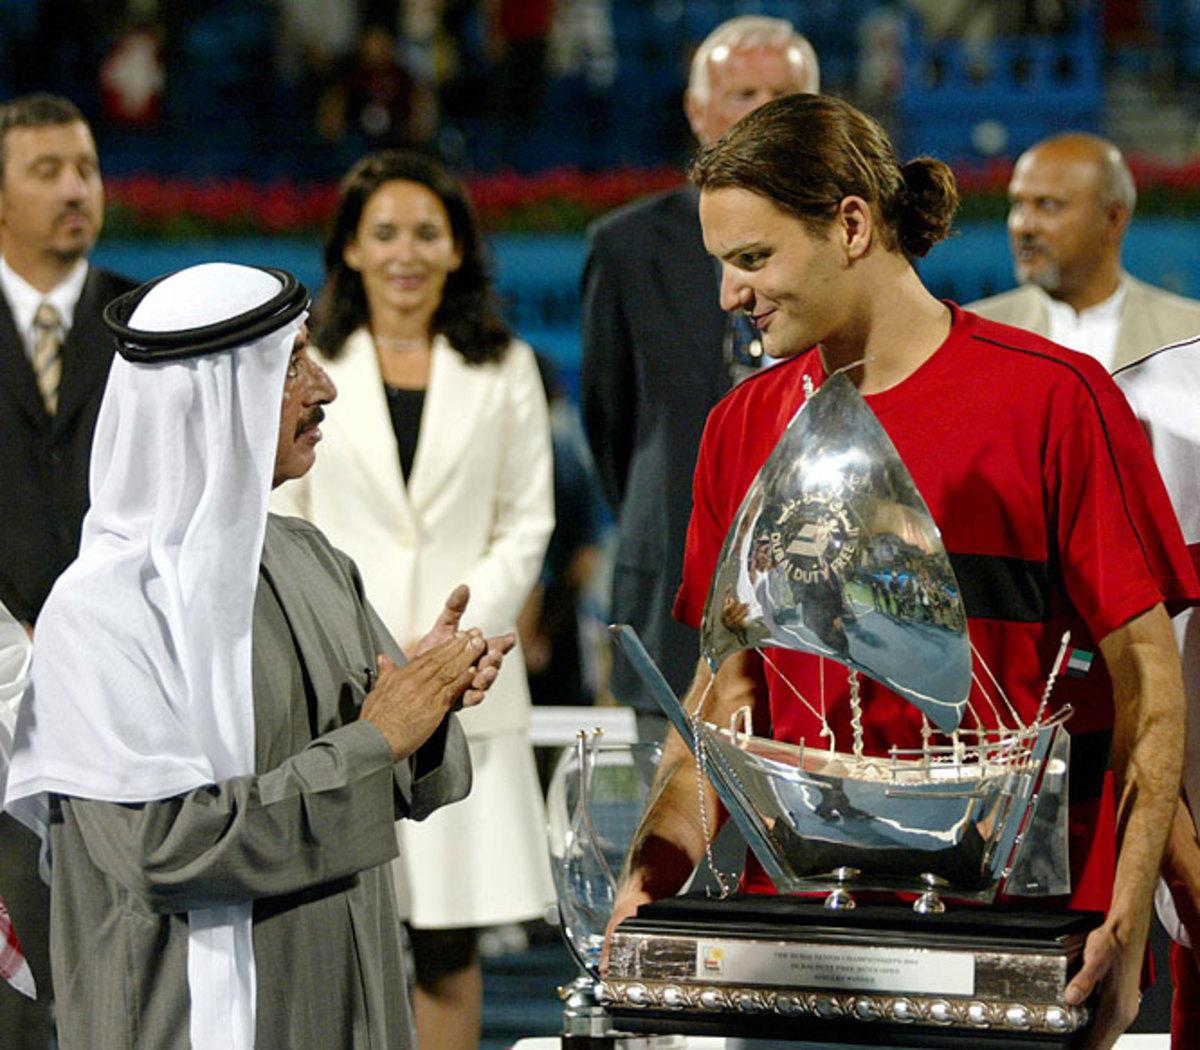 Week 5, '04 Dubai Tennis Championships   March 1, 2004